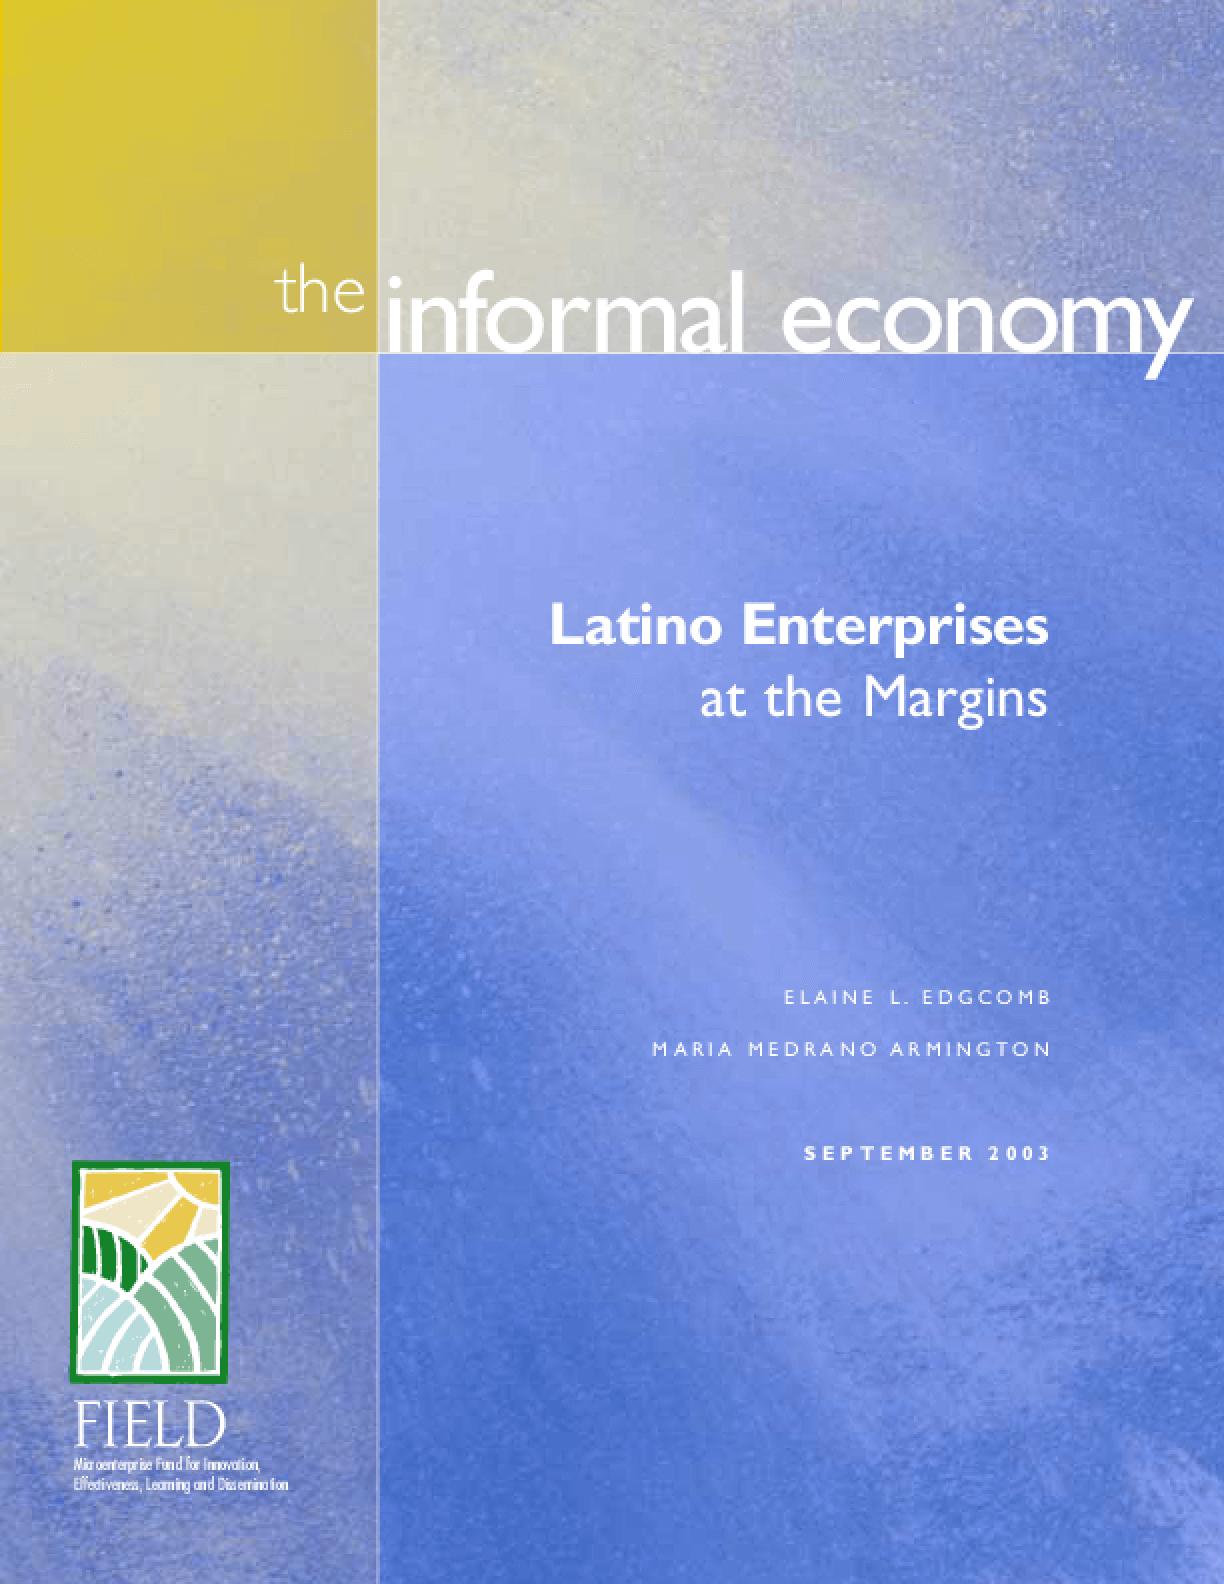 The Informal Economy: Latino Enterprises at the Margins